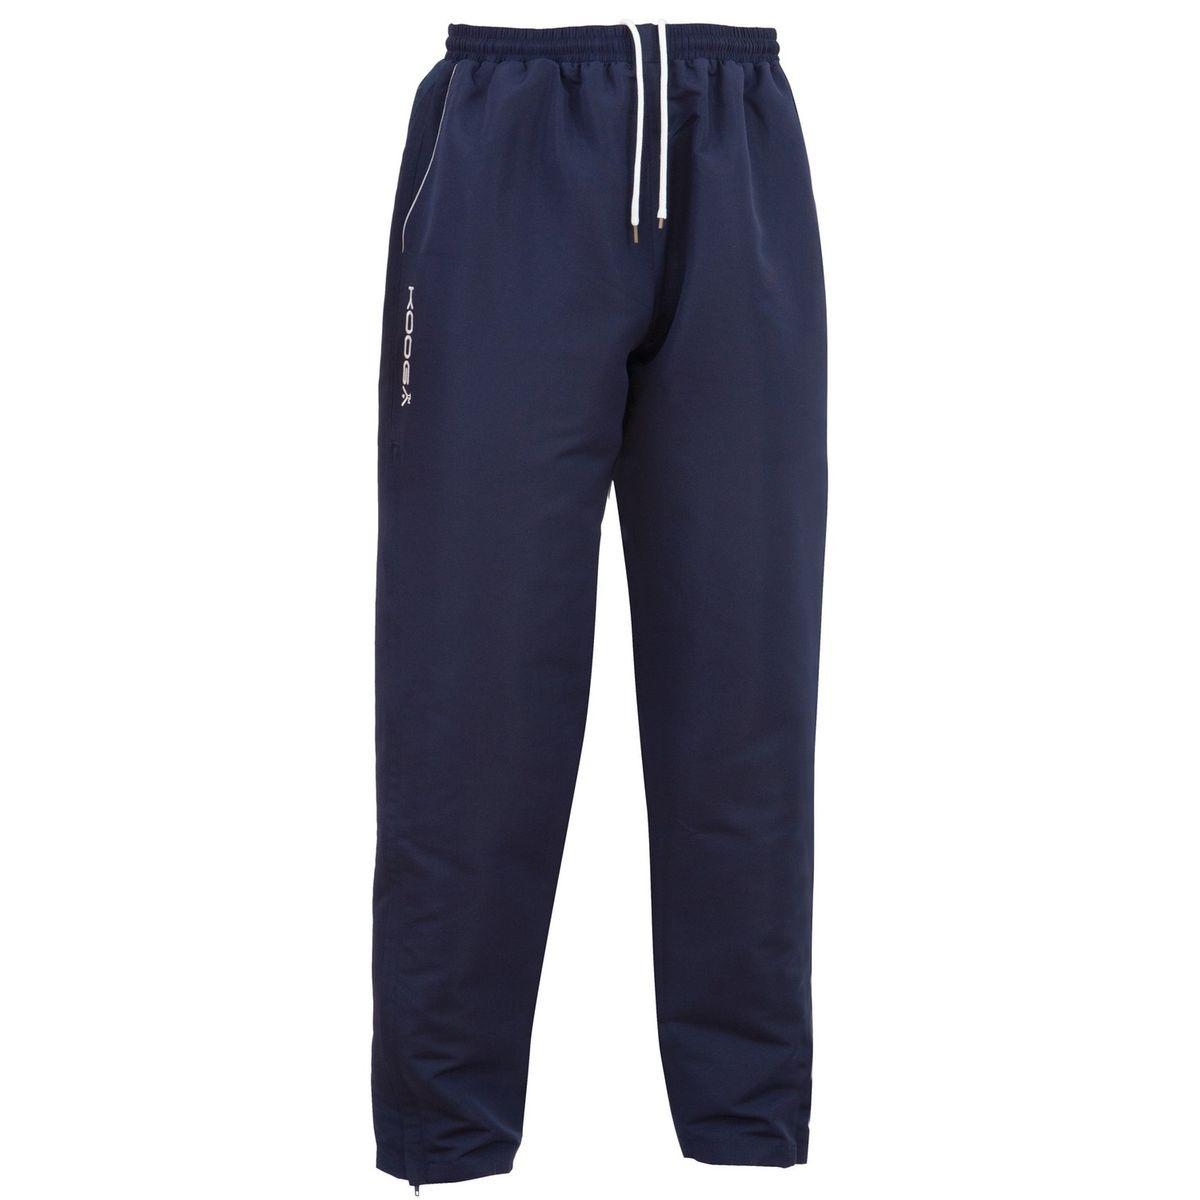 Pantalon de sport VORTEX